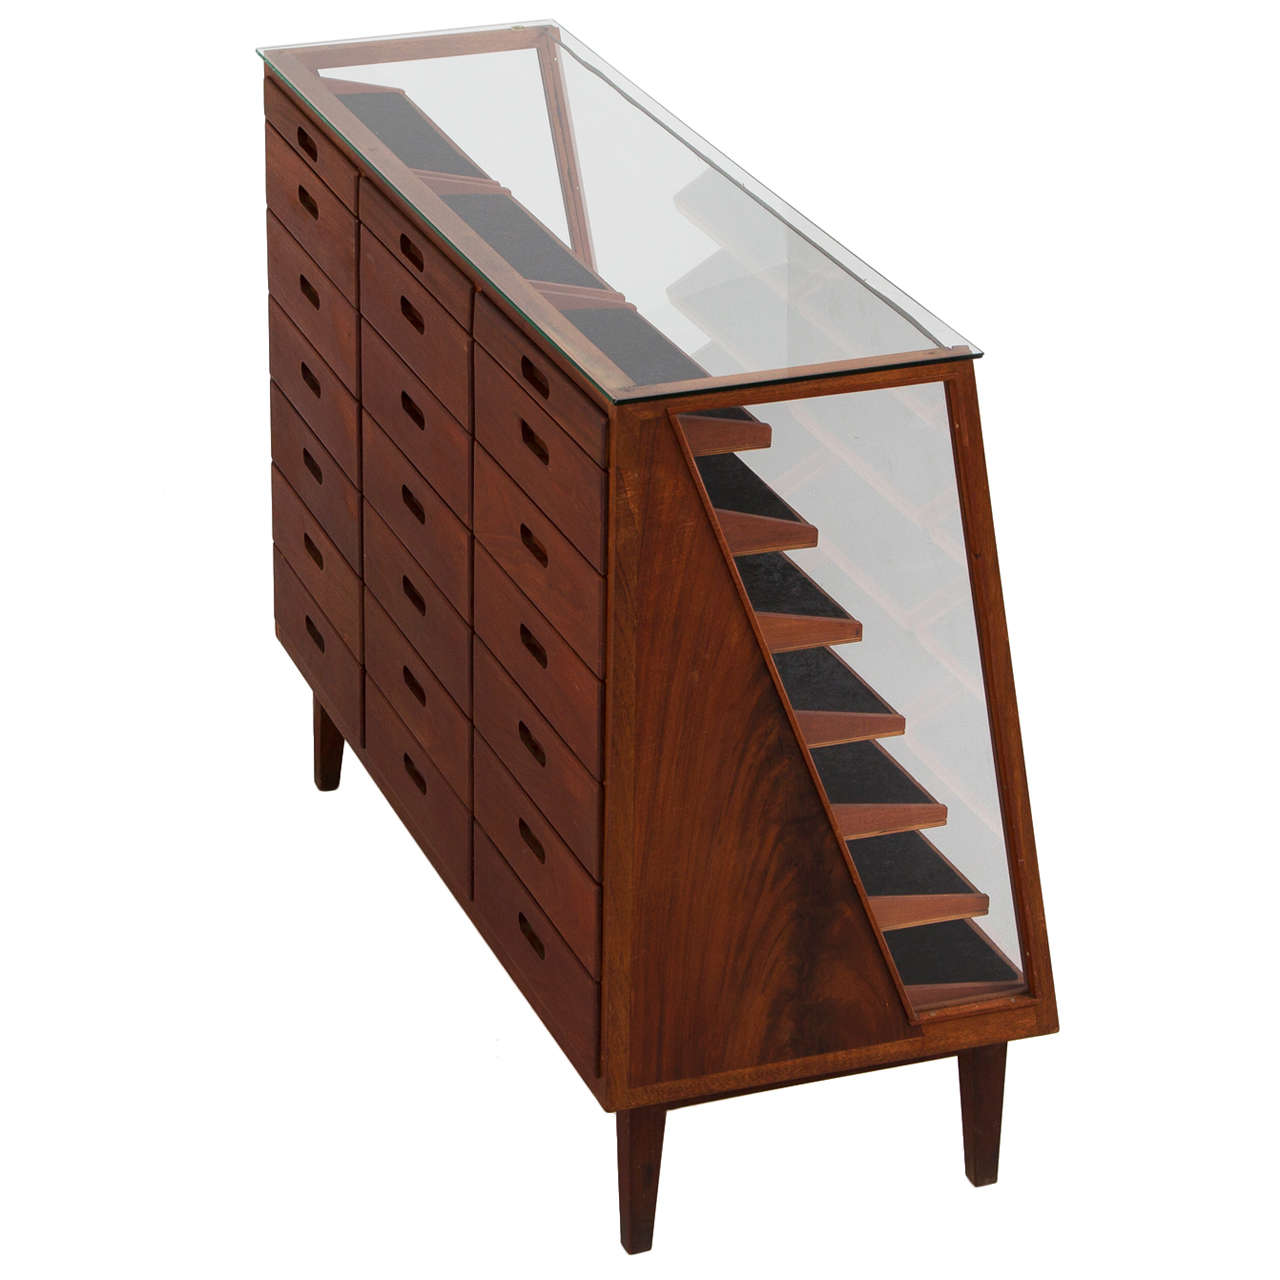 elegant showcase with several drawers at 1stdibs. Black Bedroom Furniture Sets. Home Design Ideas